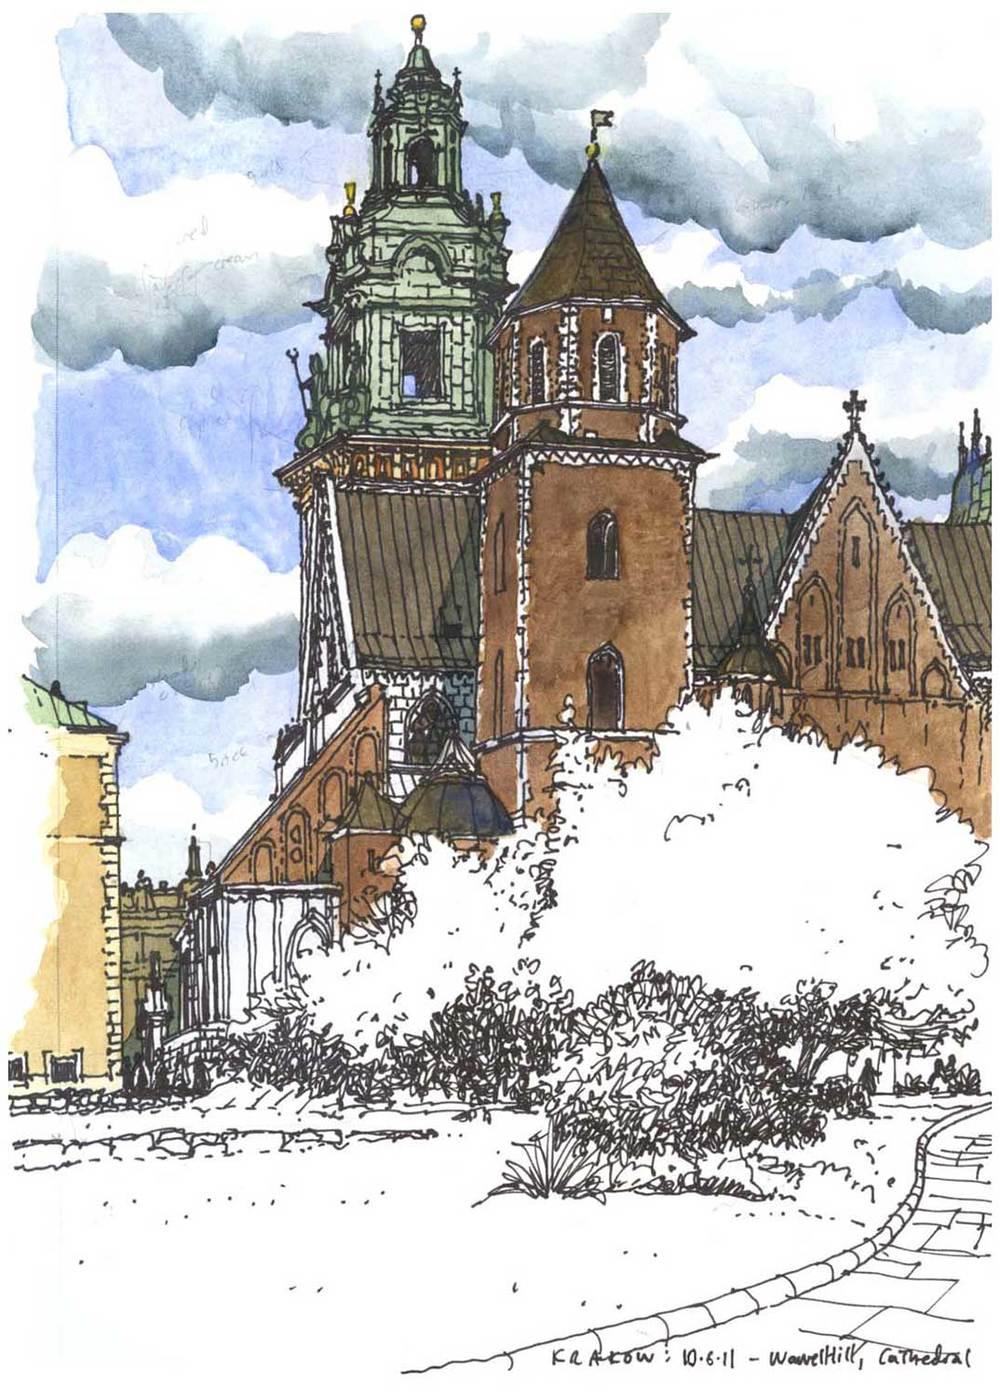 100611,-Krakow,-Wawel-Cathedral.jpg